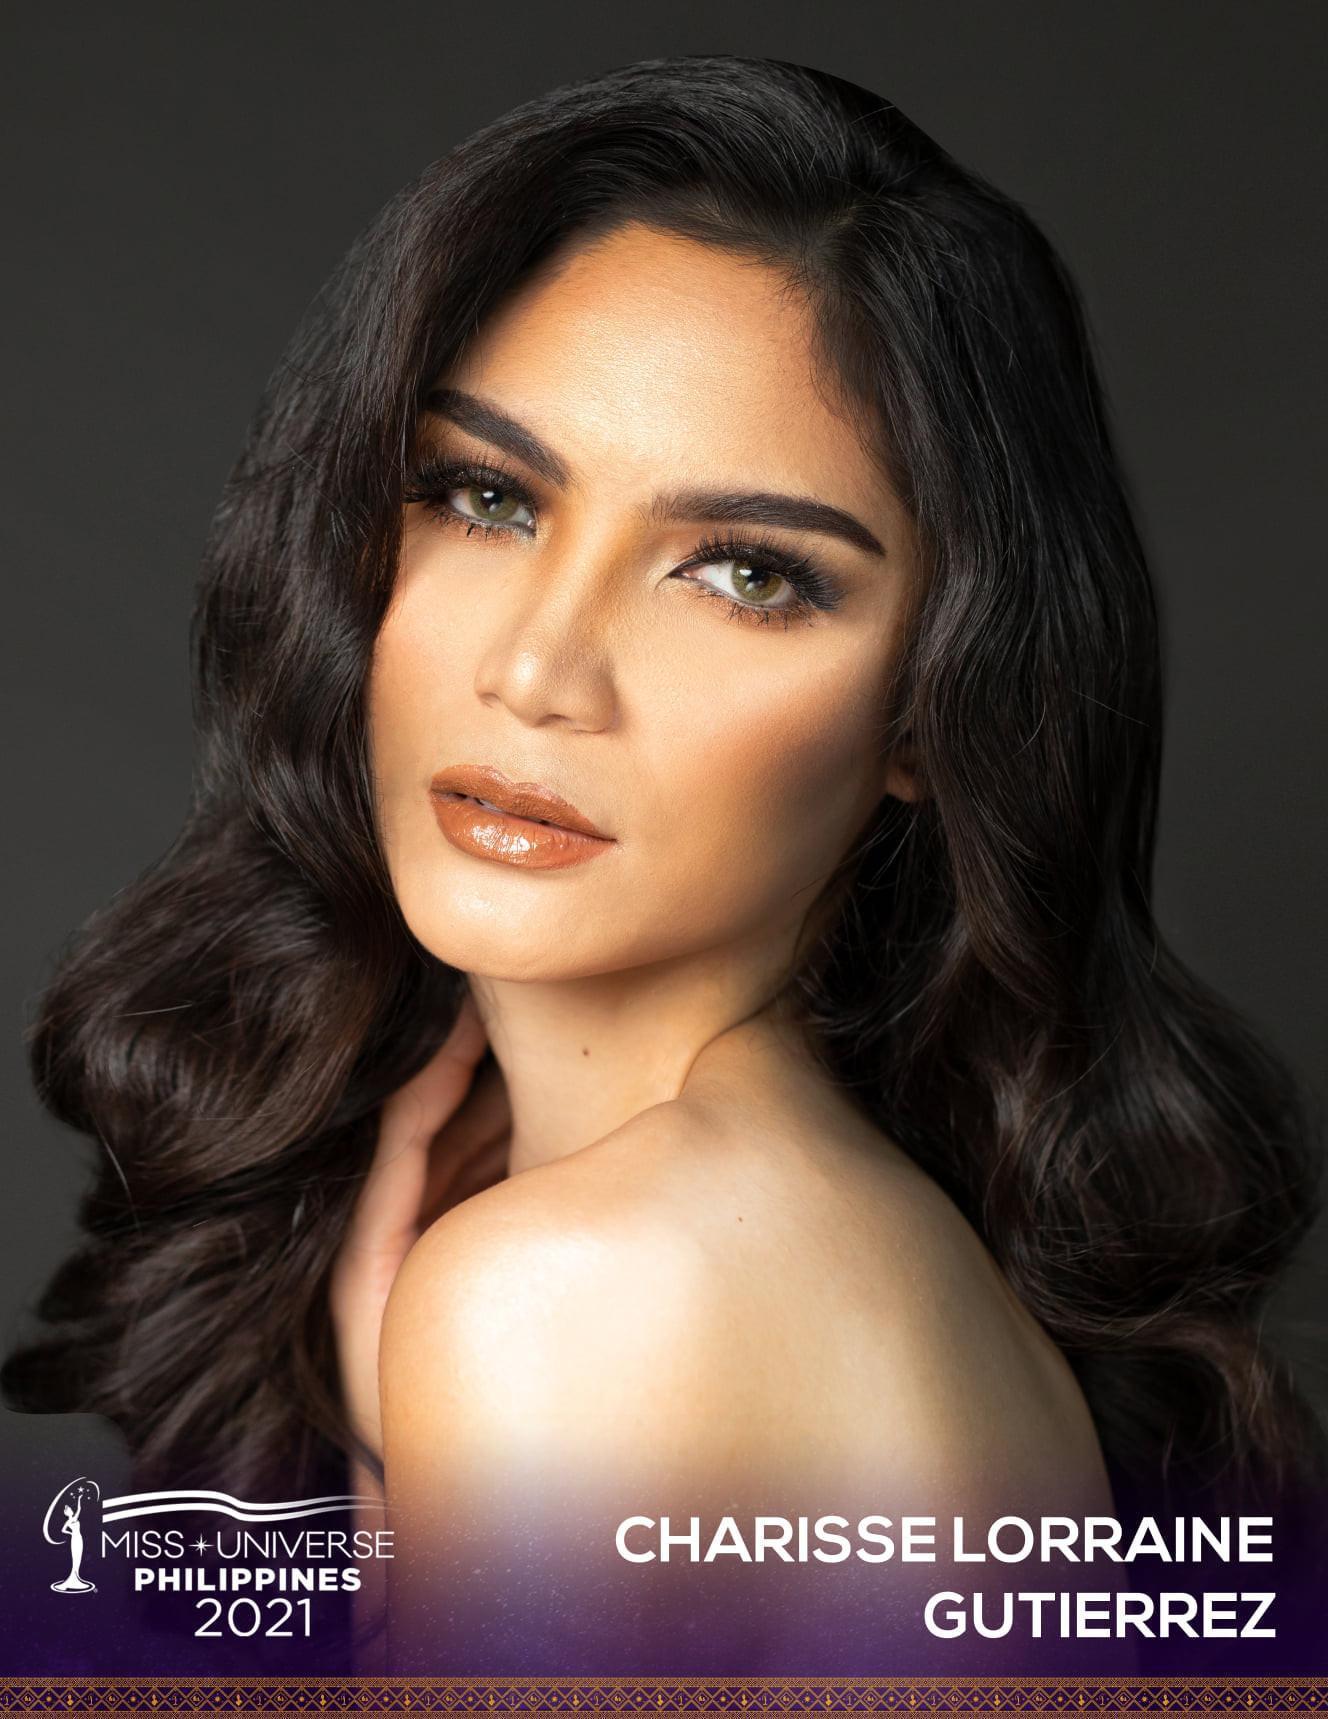 pre-candidatas a miss universe philippines 2021. - Página 4 Al5H8b